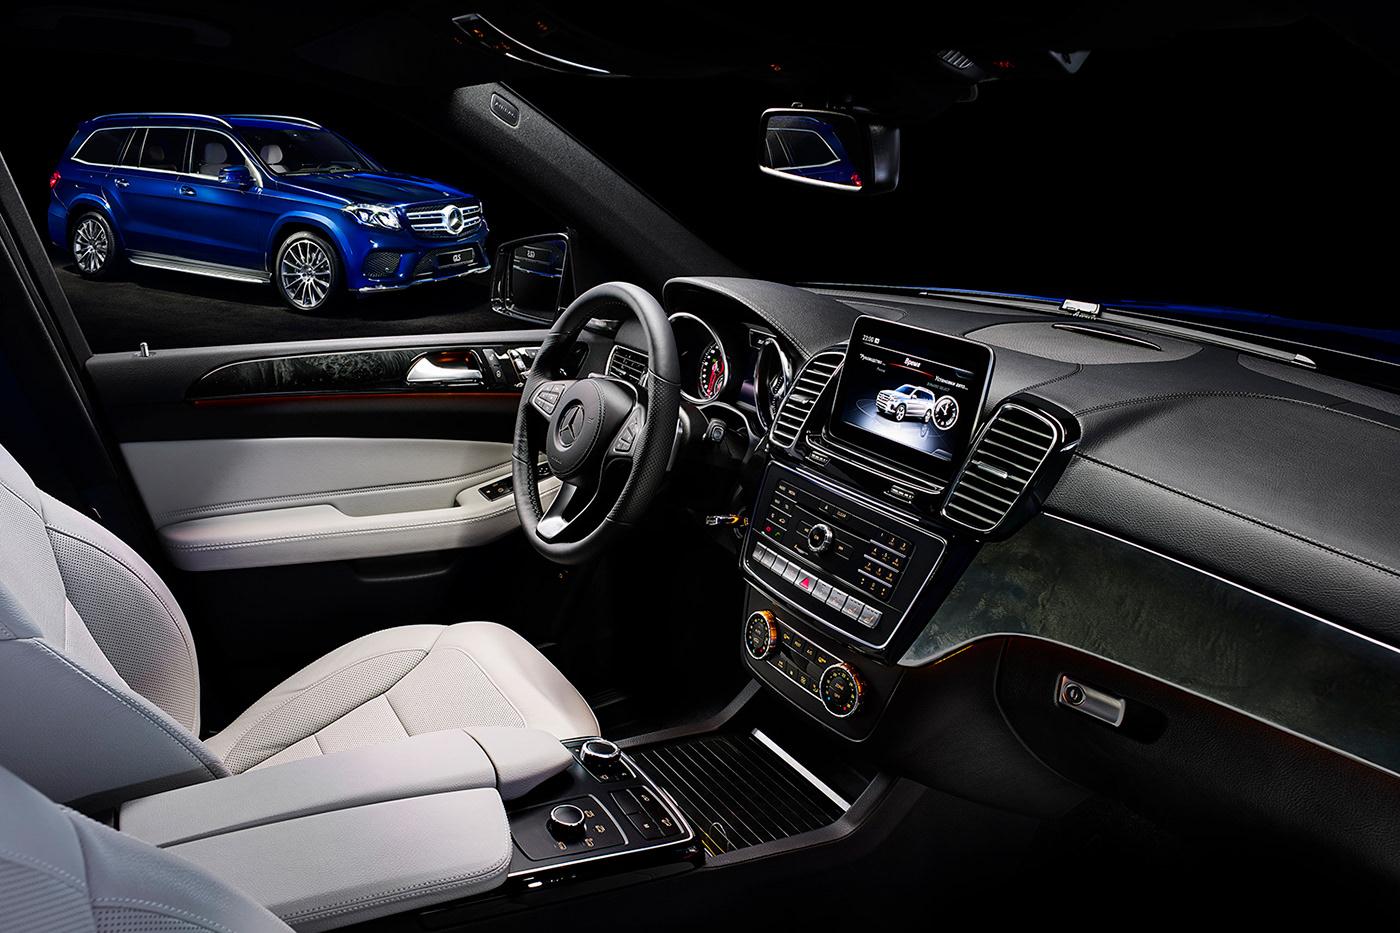 dmitry zhuravlev Photography  automotive   mercedes Mercedes GLS Esquire